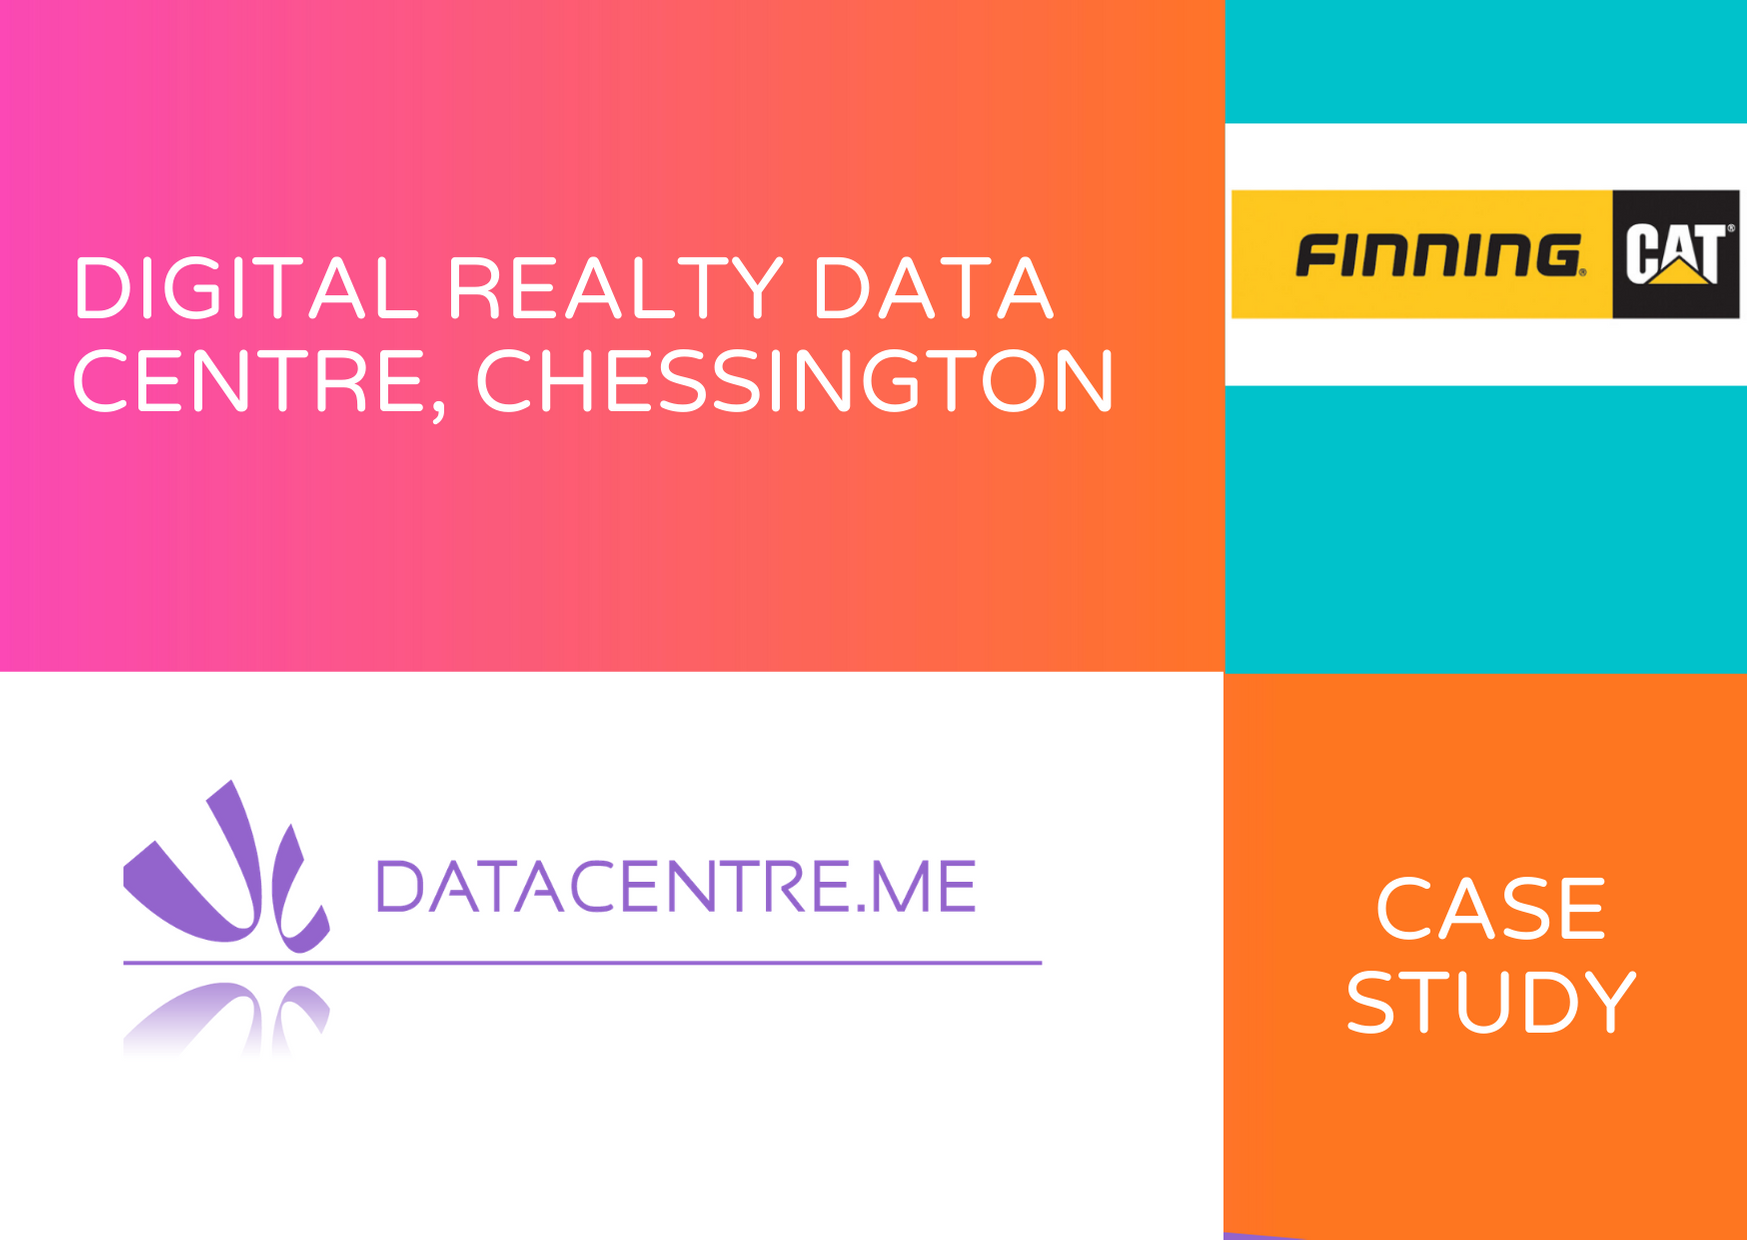 Finning Case Study Digital realty chessington